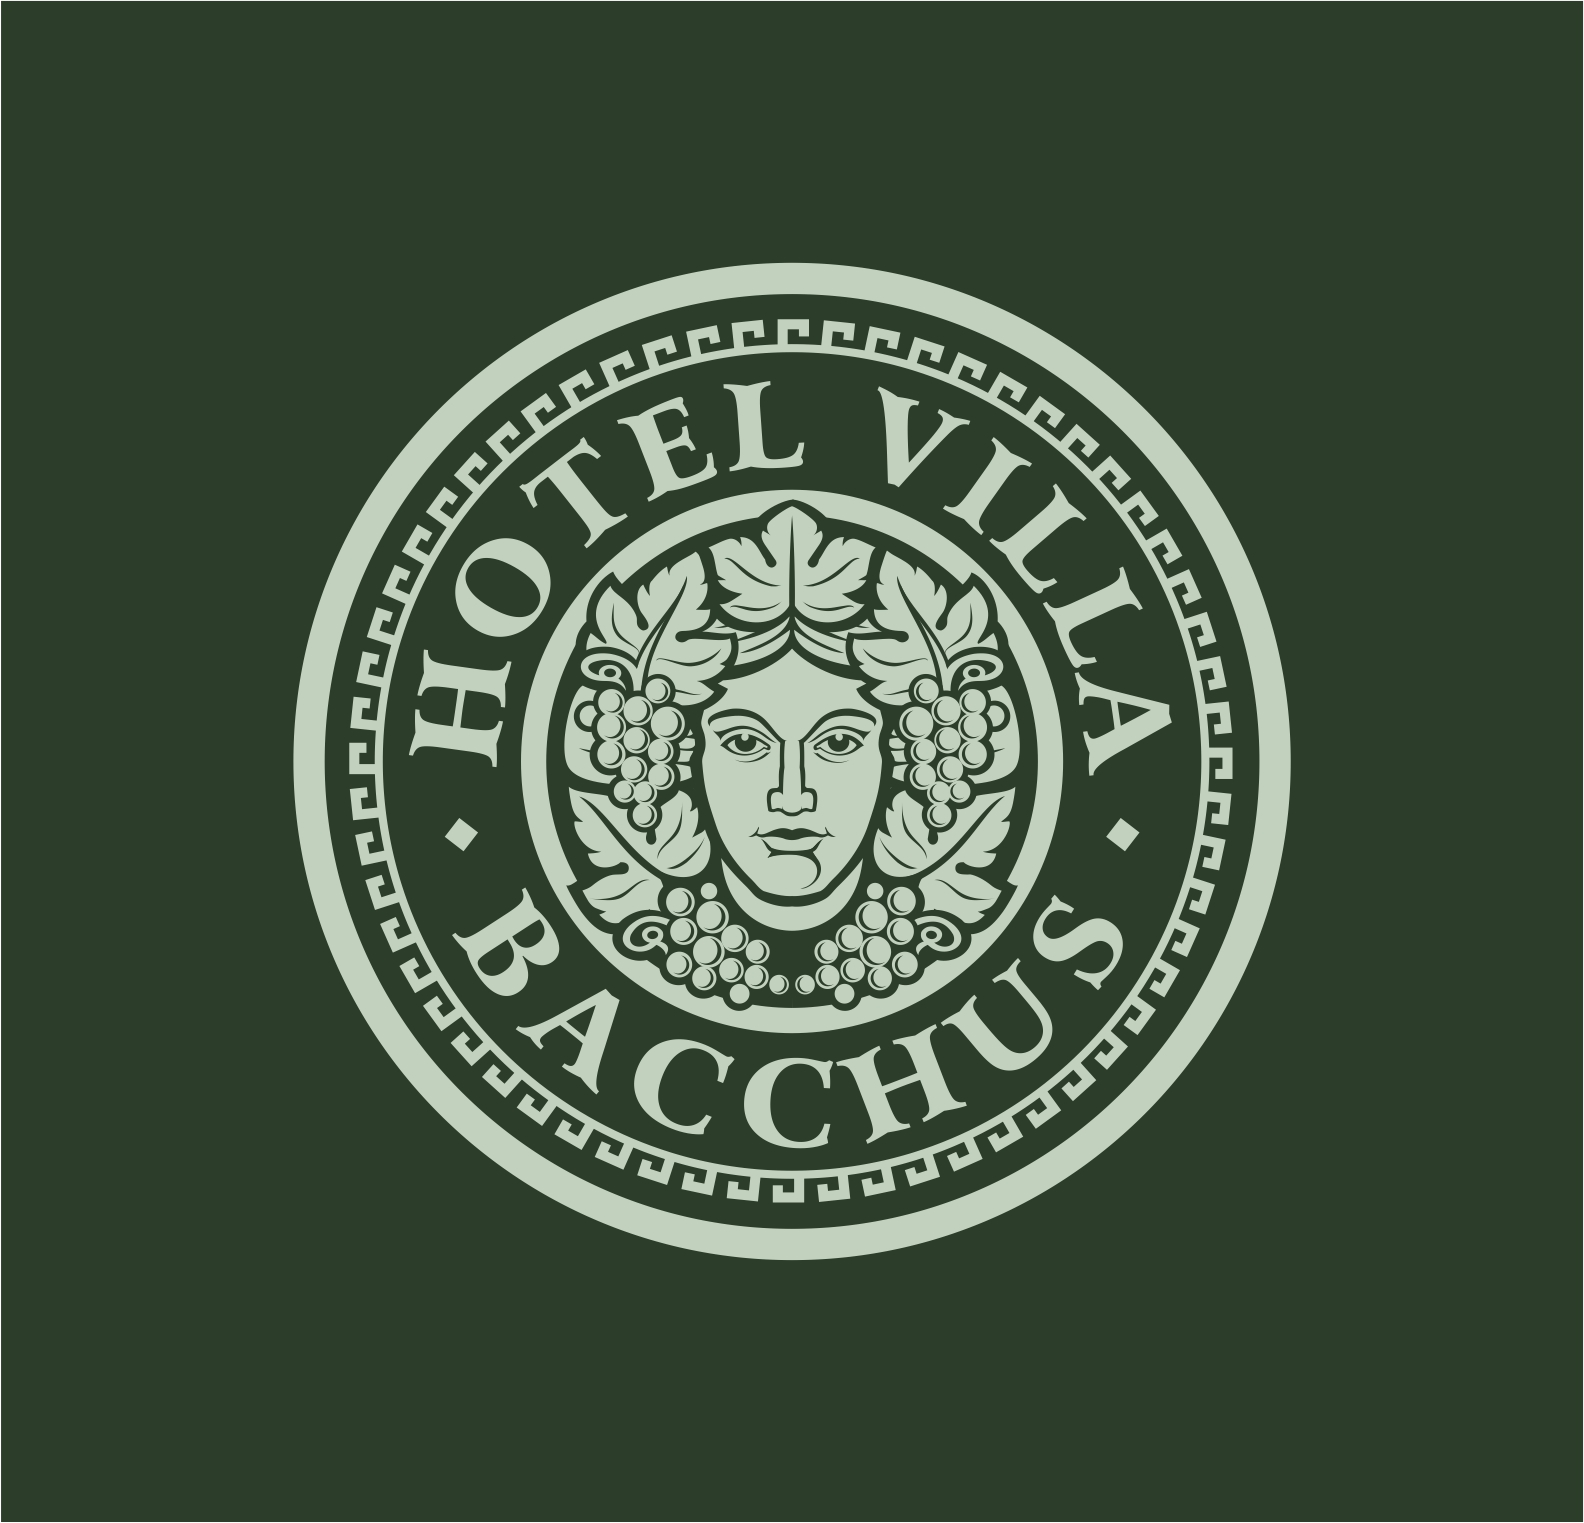 Bacchus logo crest.   Logotip s prikazom boga Bacchusa/Dionisa.